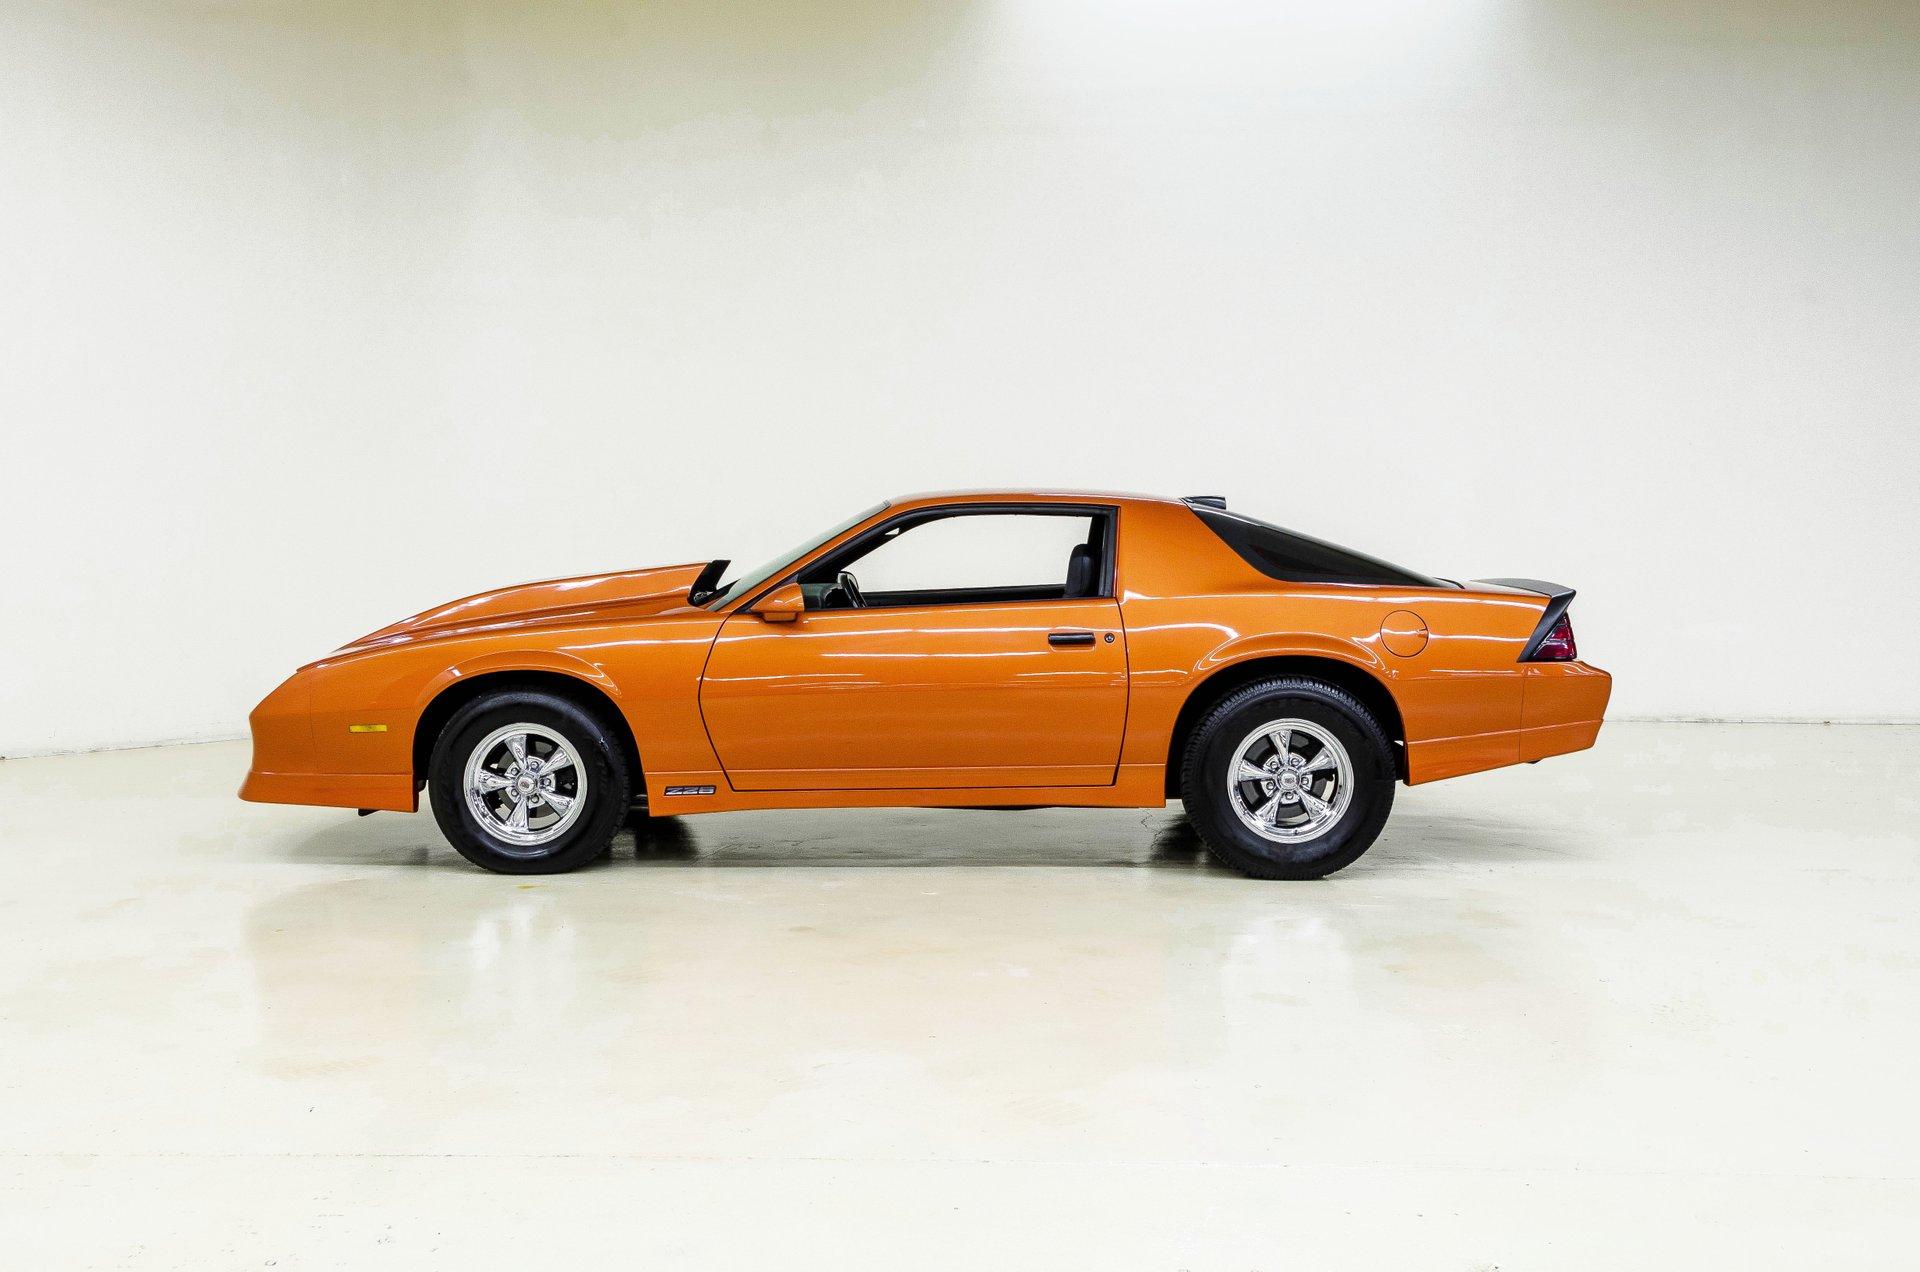 1986 Chevrolet Camaro Z28 Prostreet | Auto Barn Classic Cars